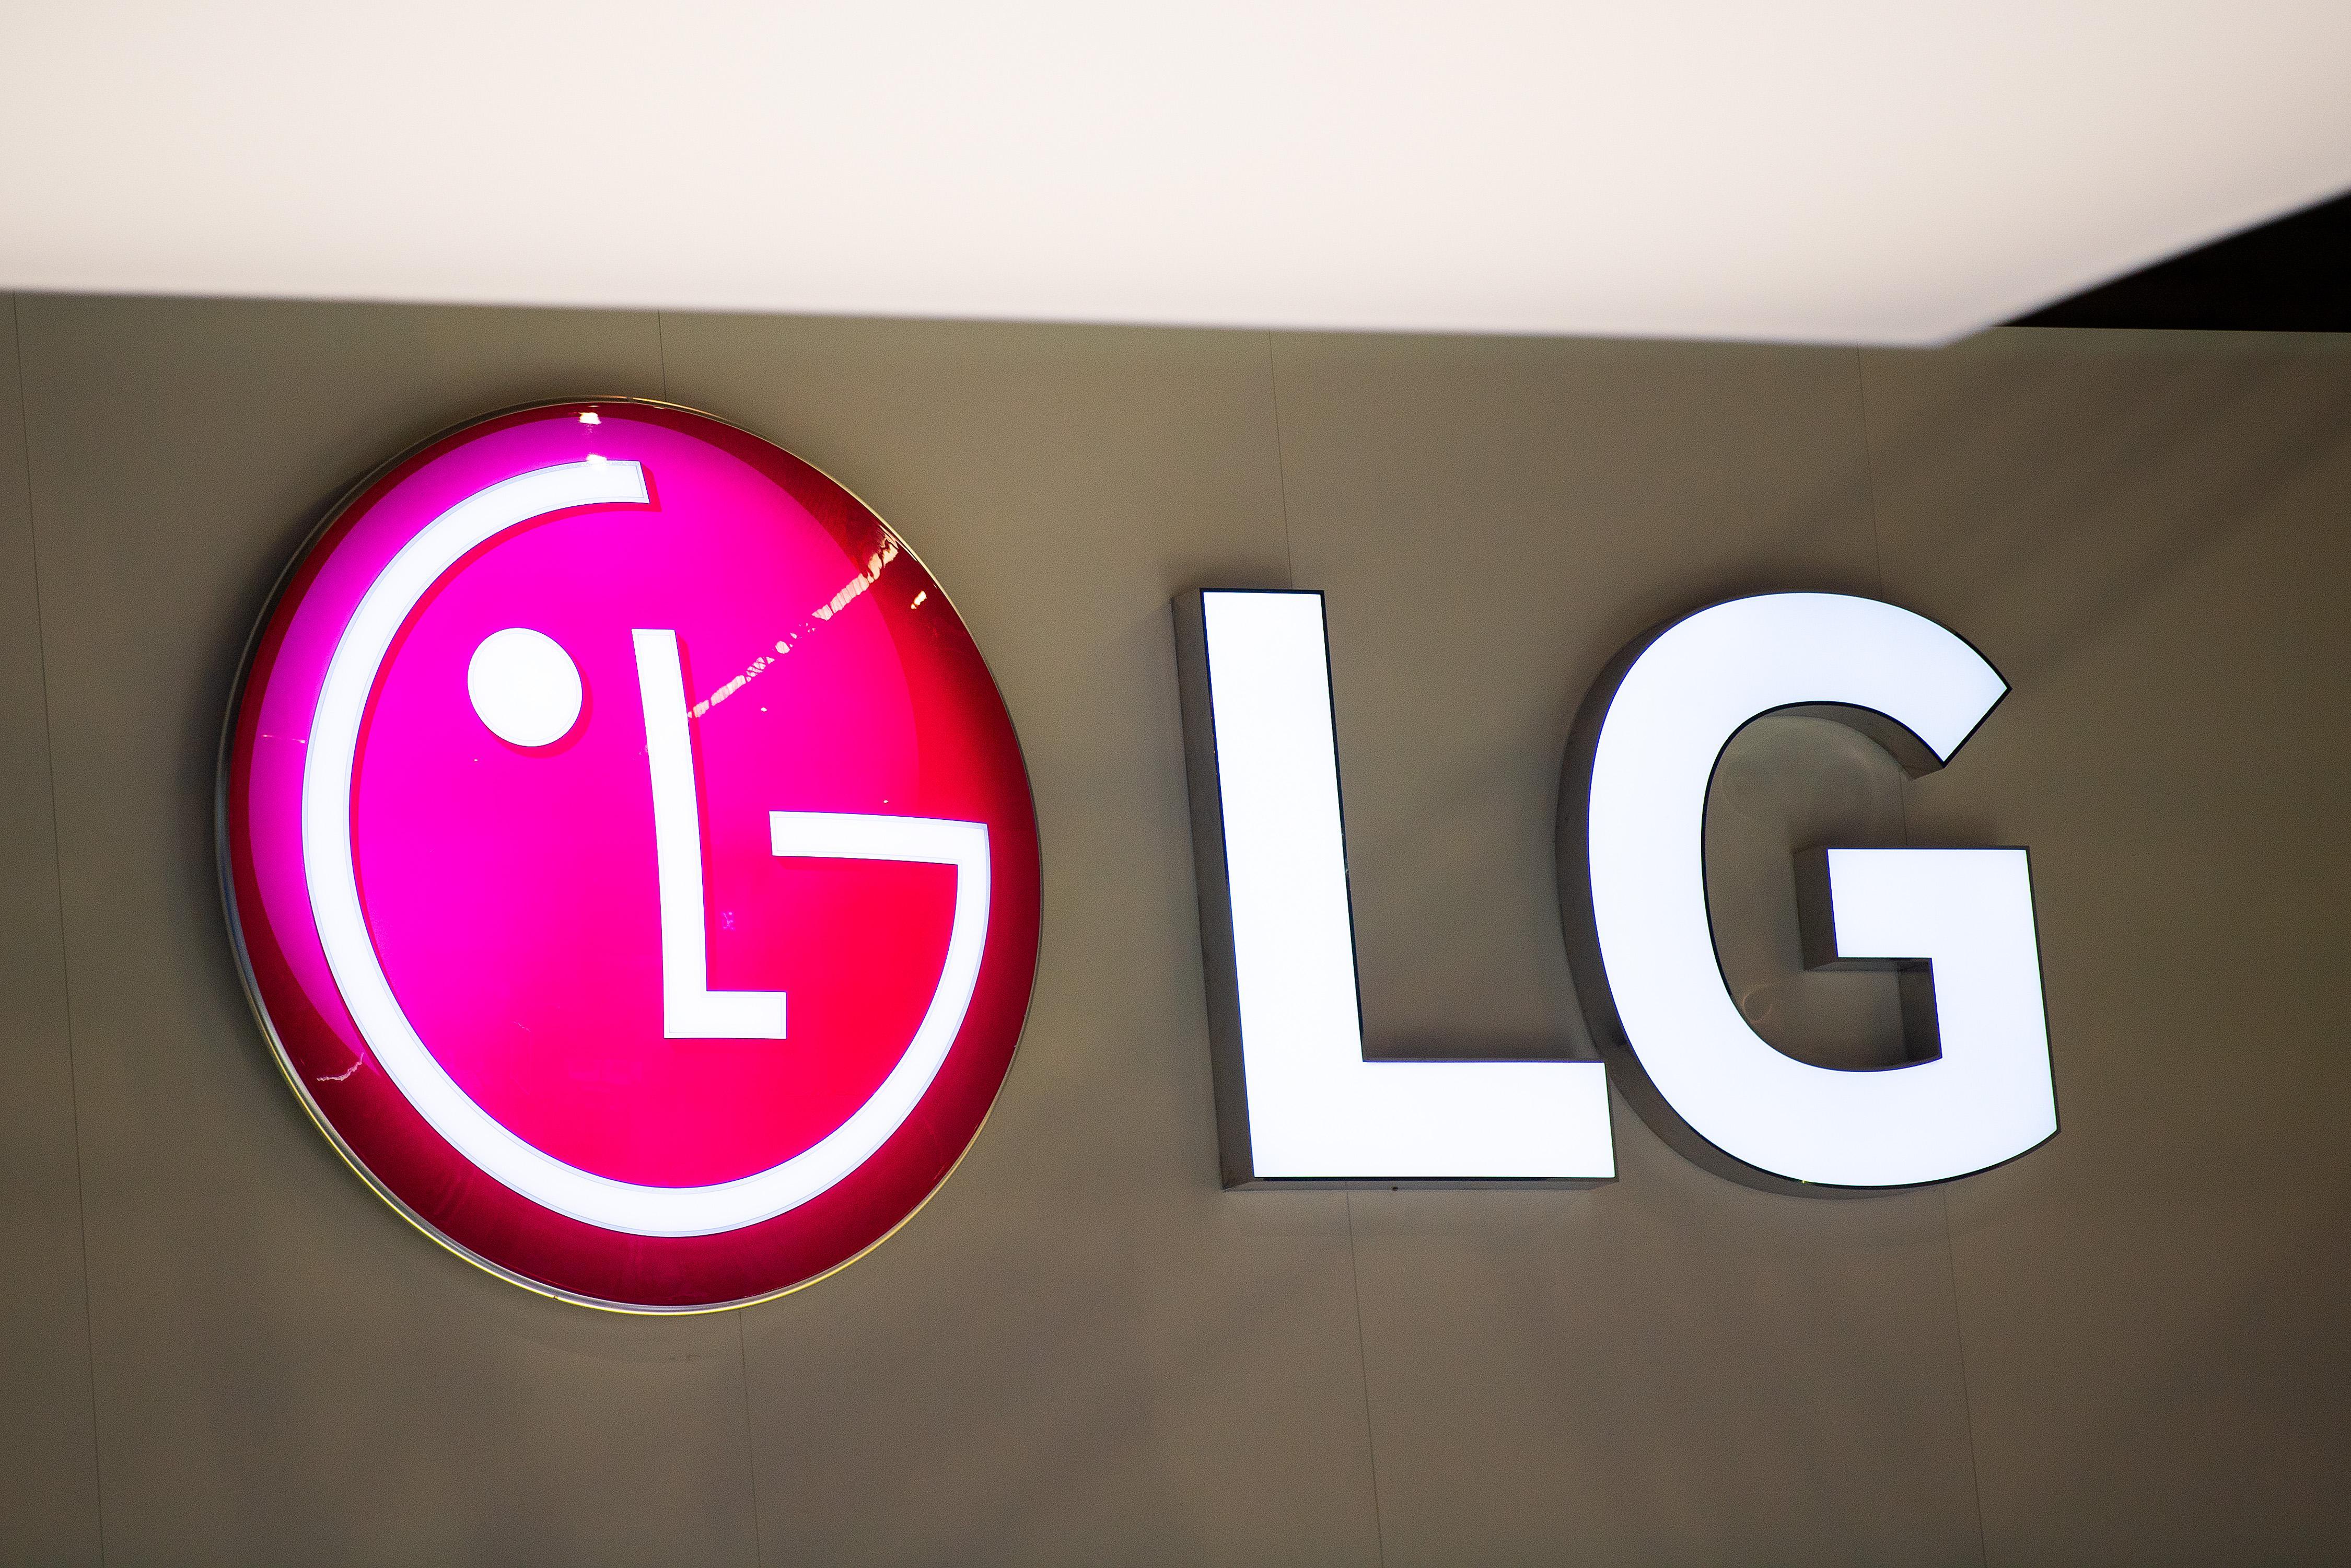 "Stare i nowe smartfony LG nara¿one s± na atak ""cold boot"". LG wyda³o stosown± ³atkê"